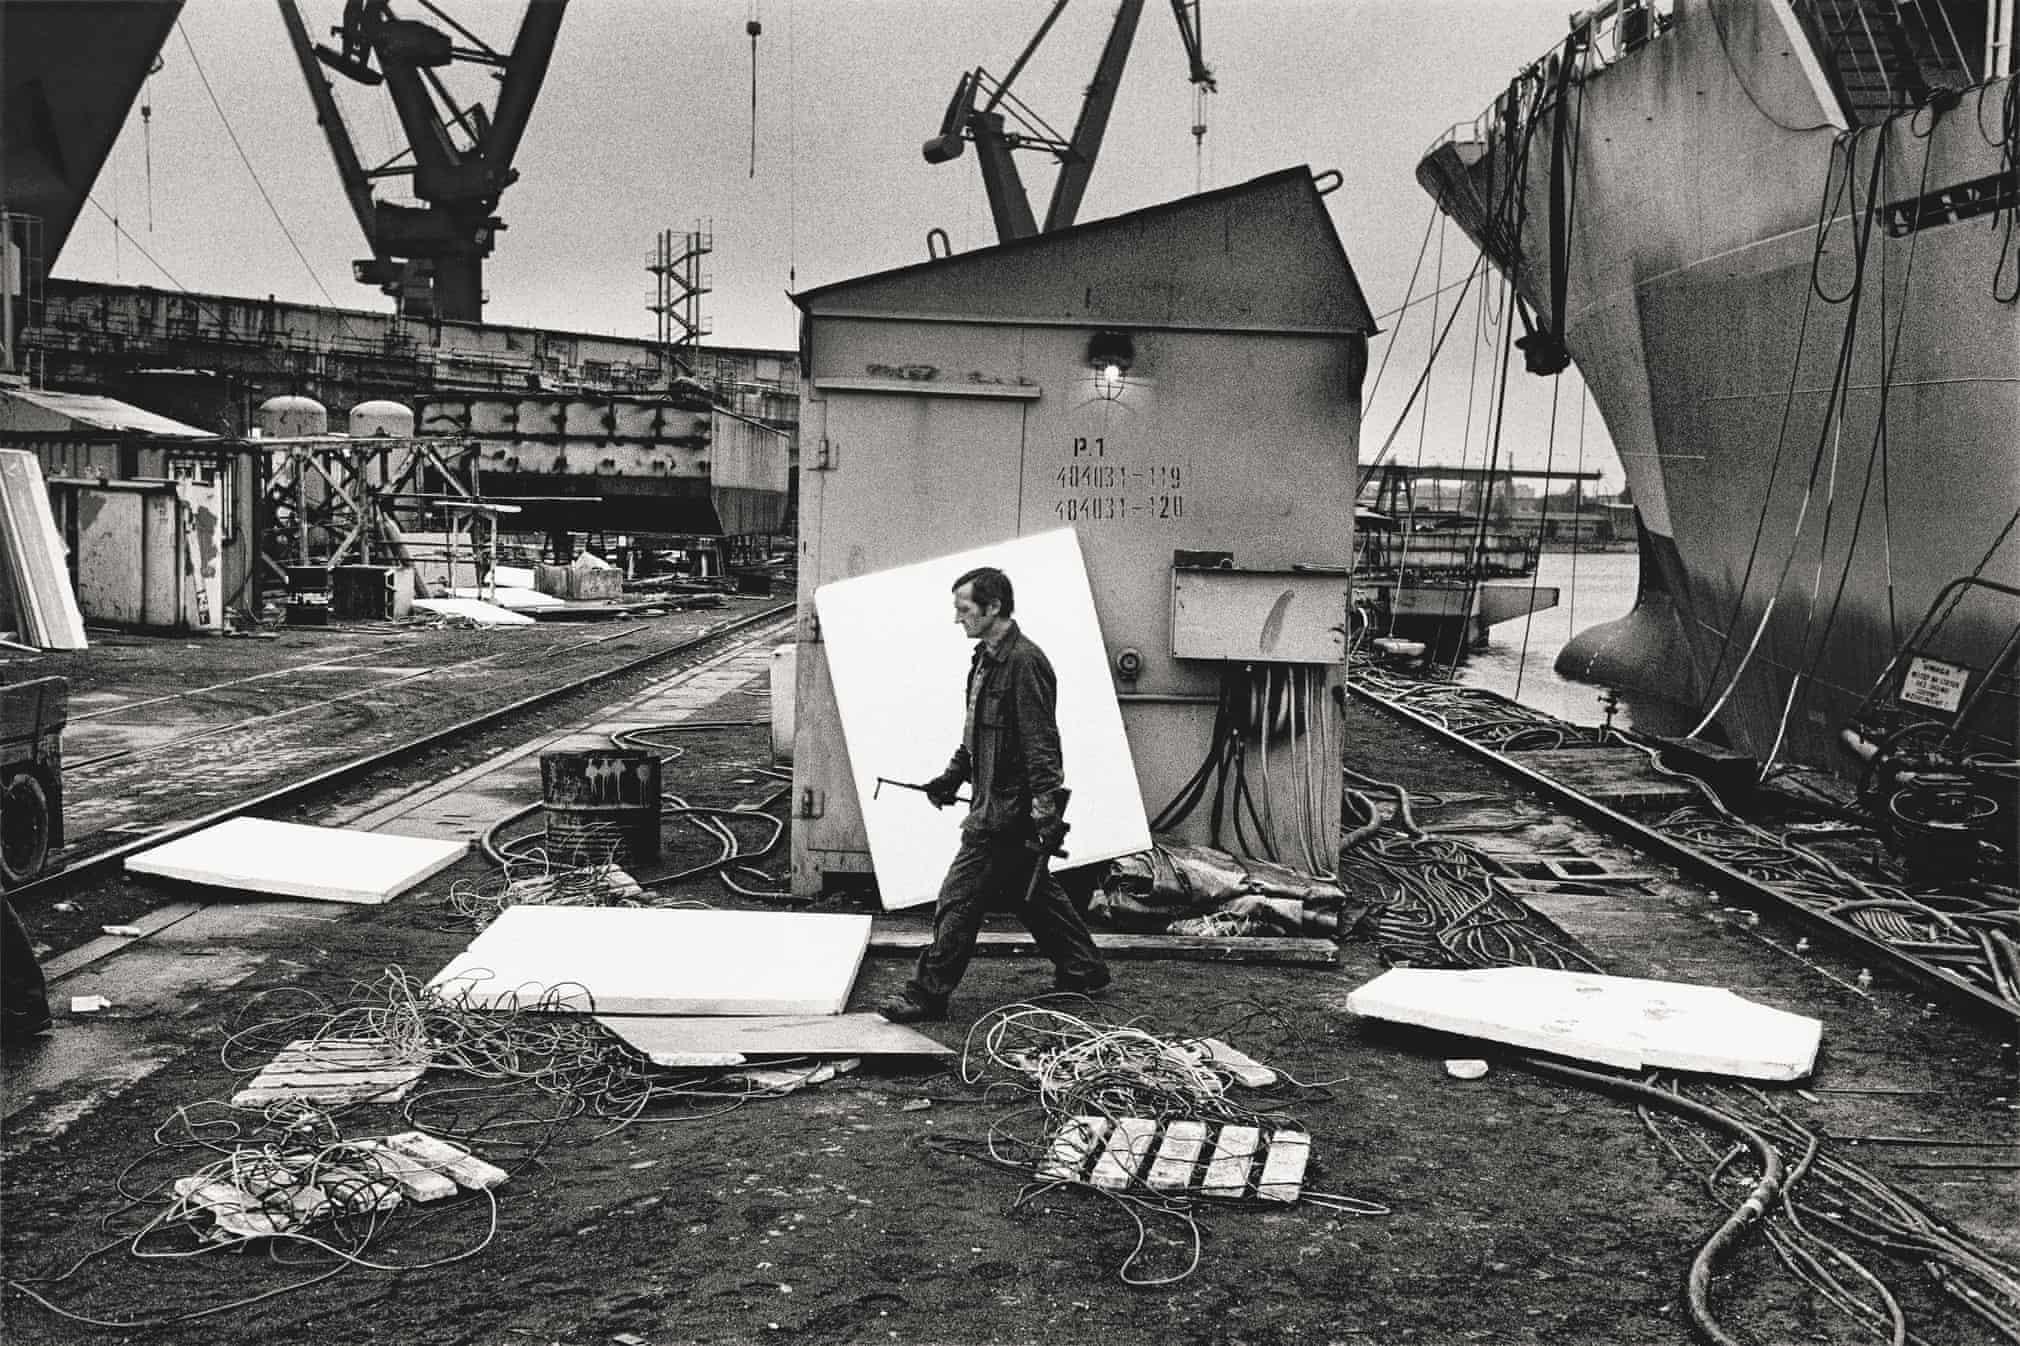 A worker leaving a ship in construction in Gdansk Shipyard, 1990